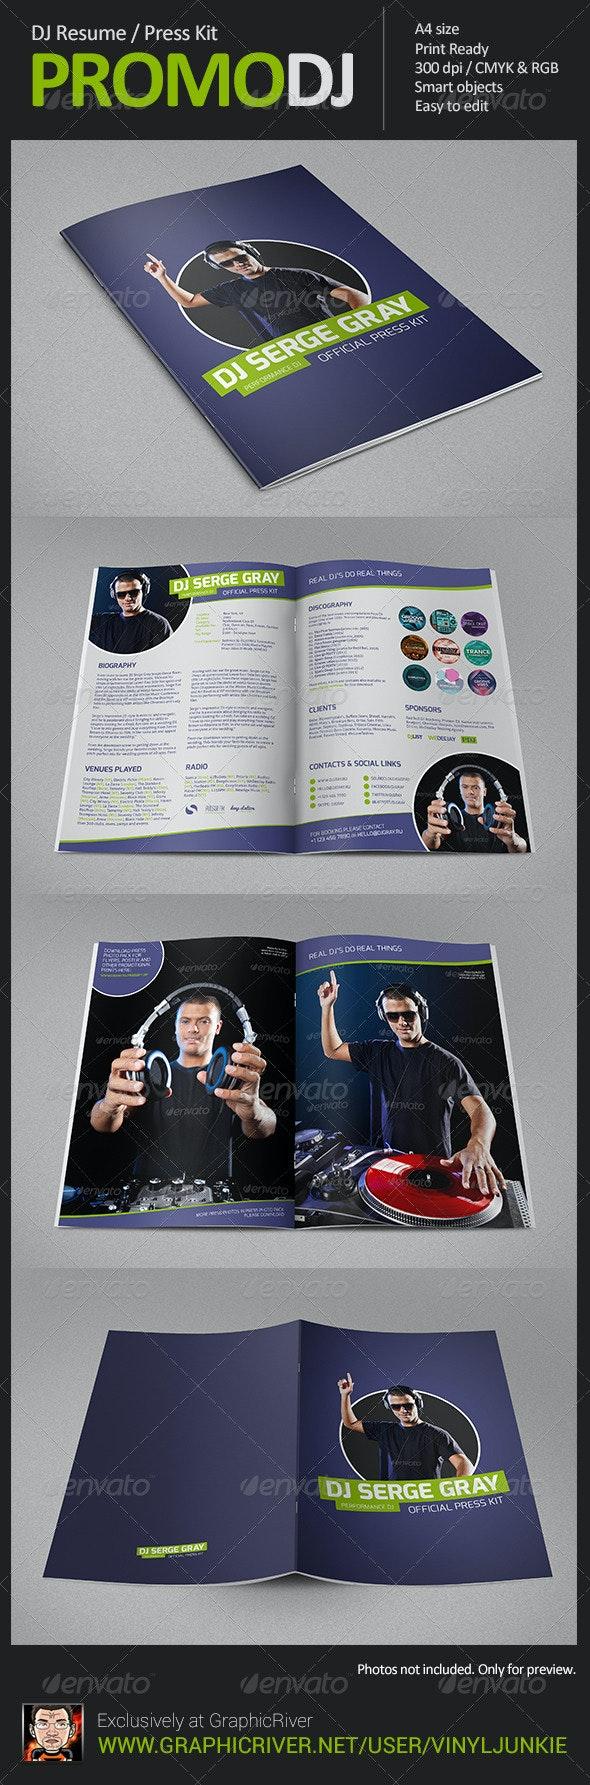 PromoDJ - DJ Resume / Press Kit - Resumes Stationery